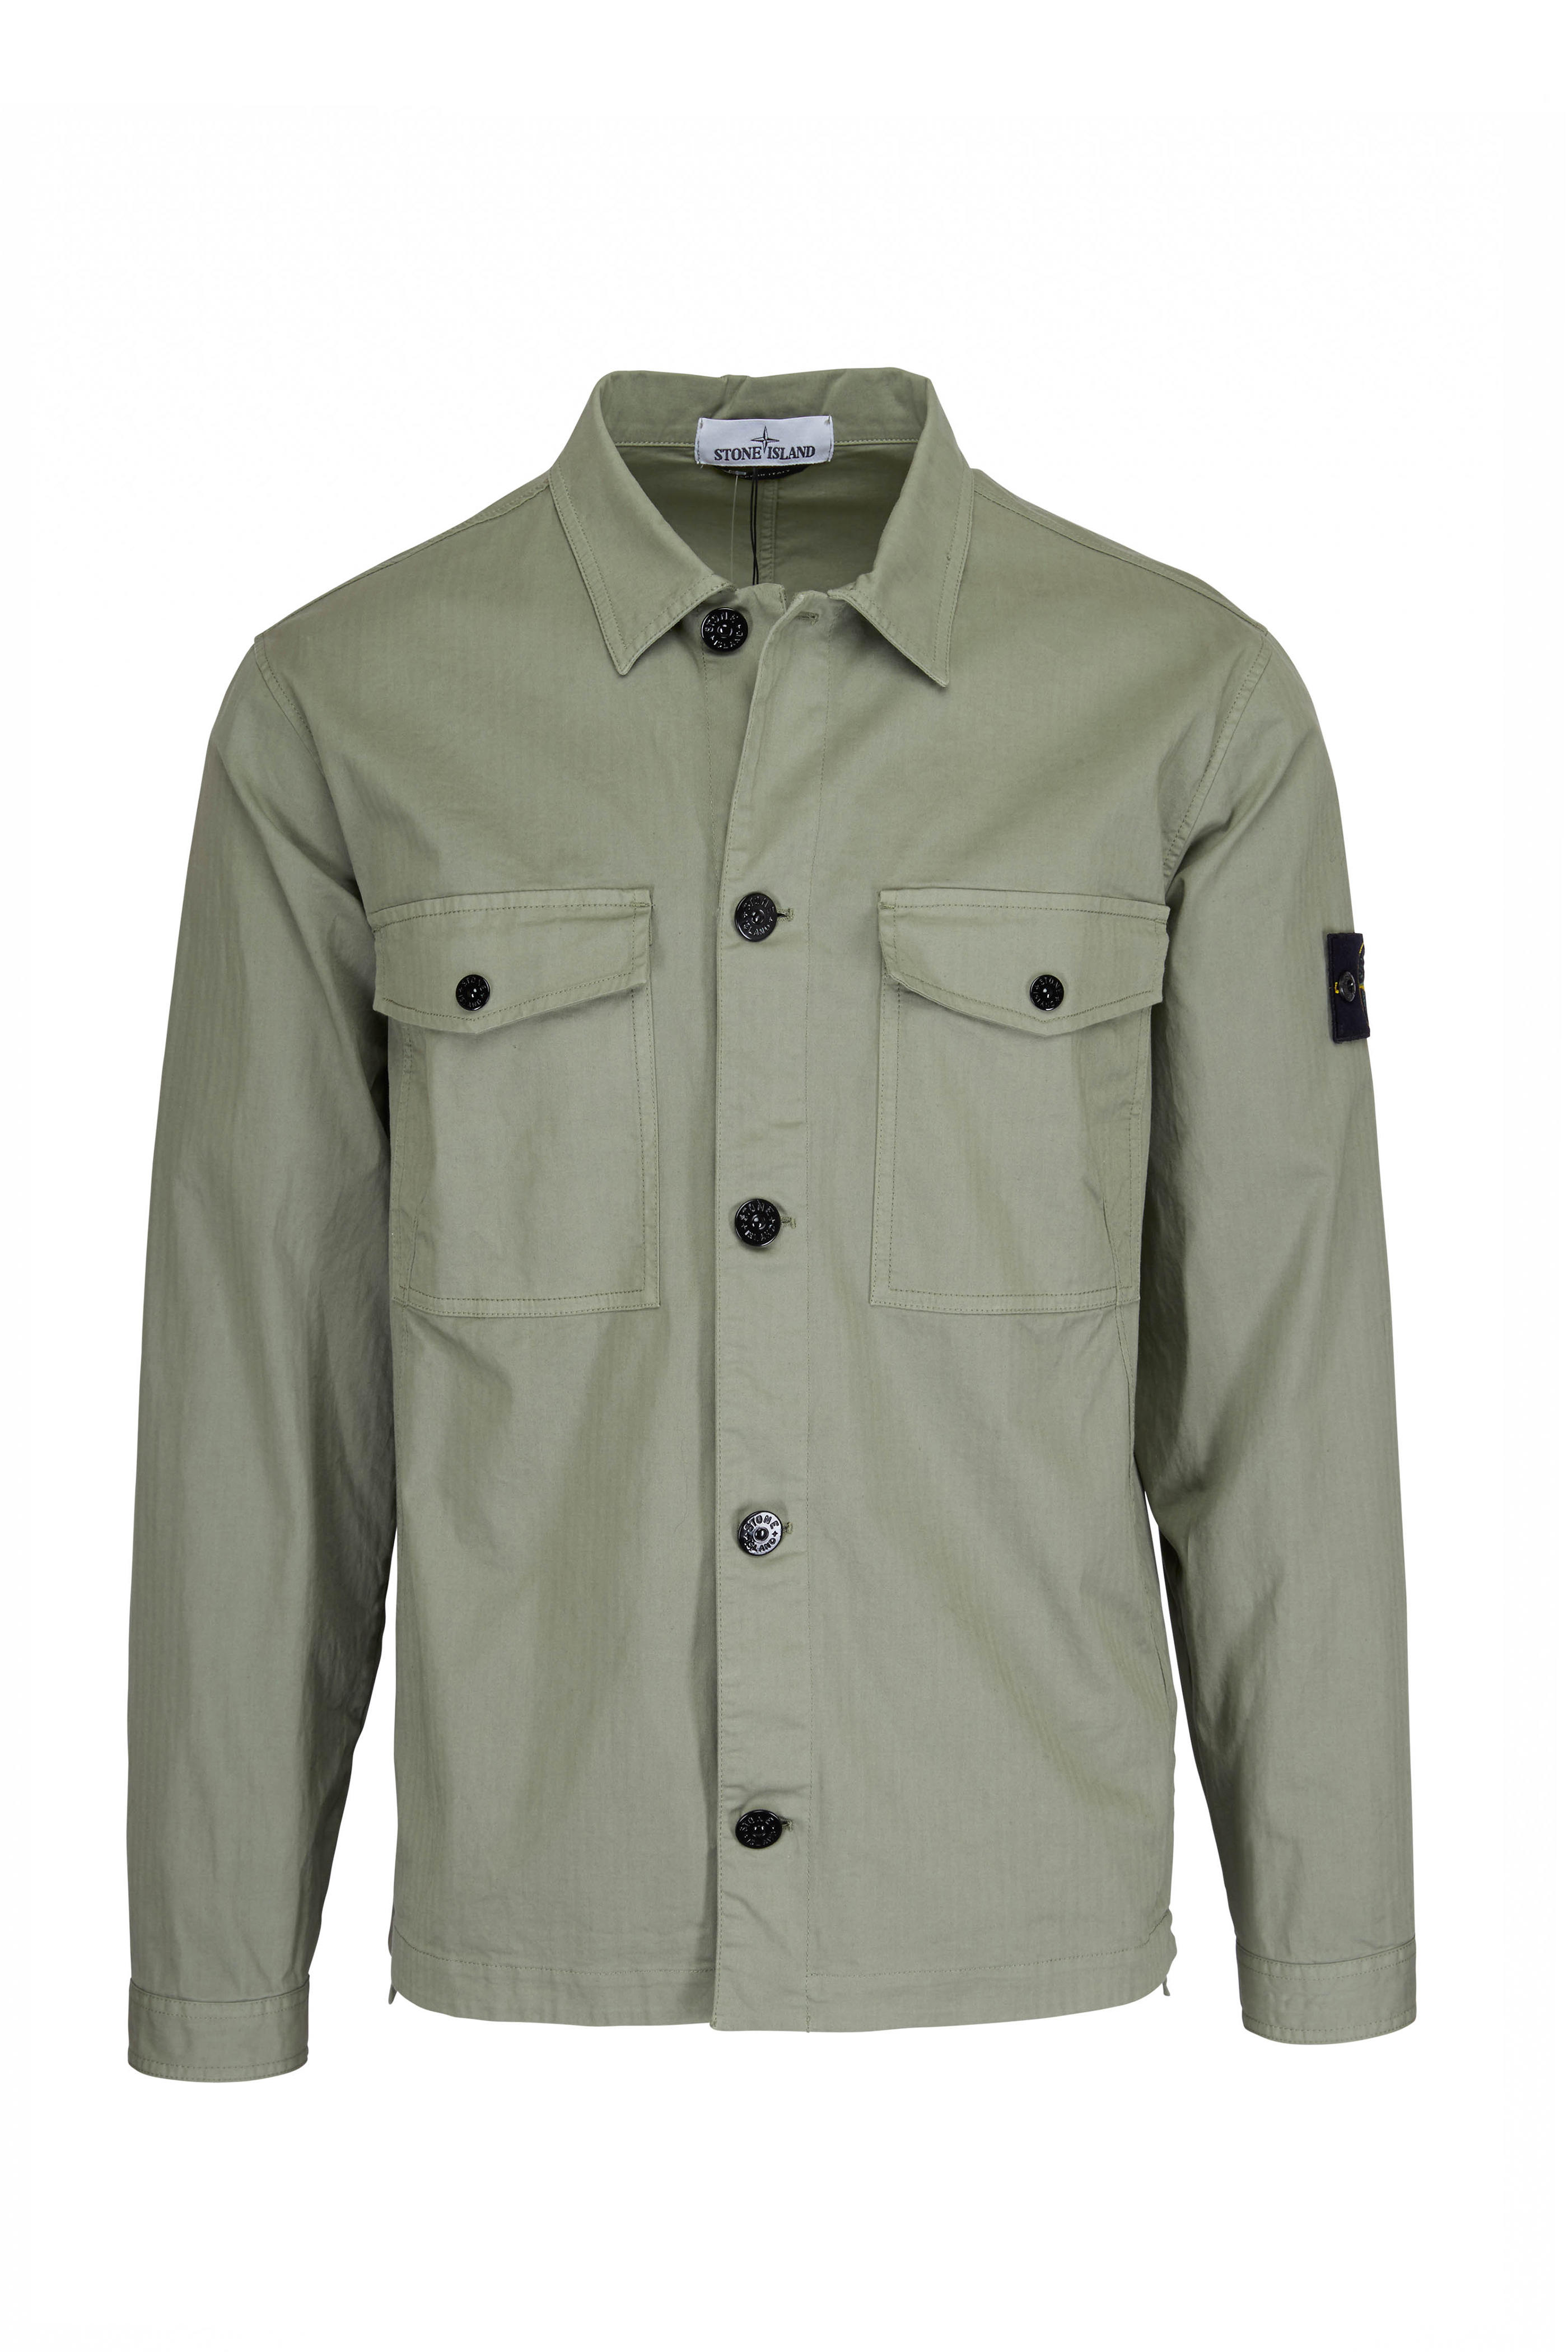 ce1789c98e72 Stone Island - 12002 Sage Cotton Two-Patch Pocket Overshirt ...